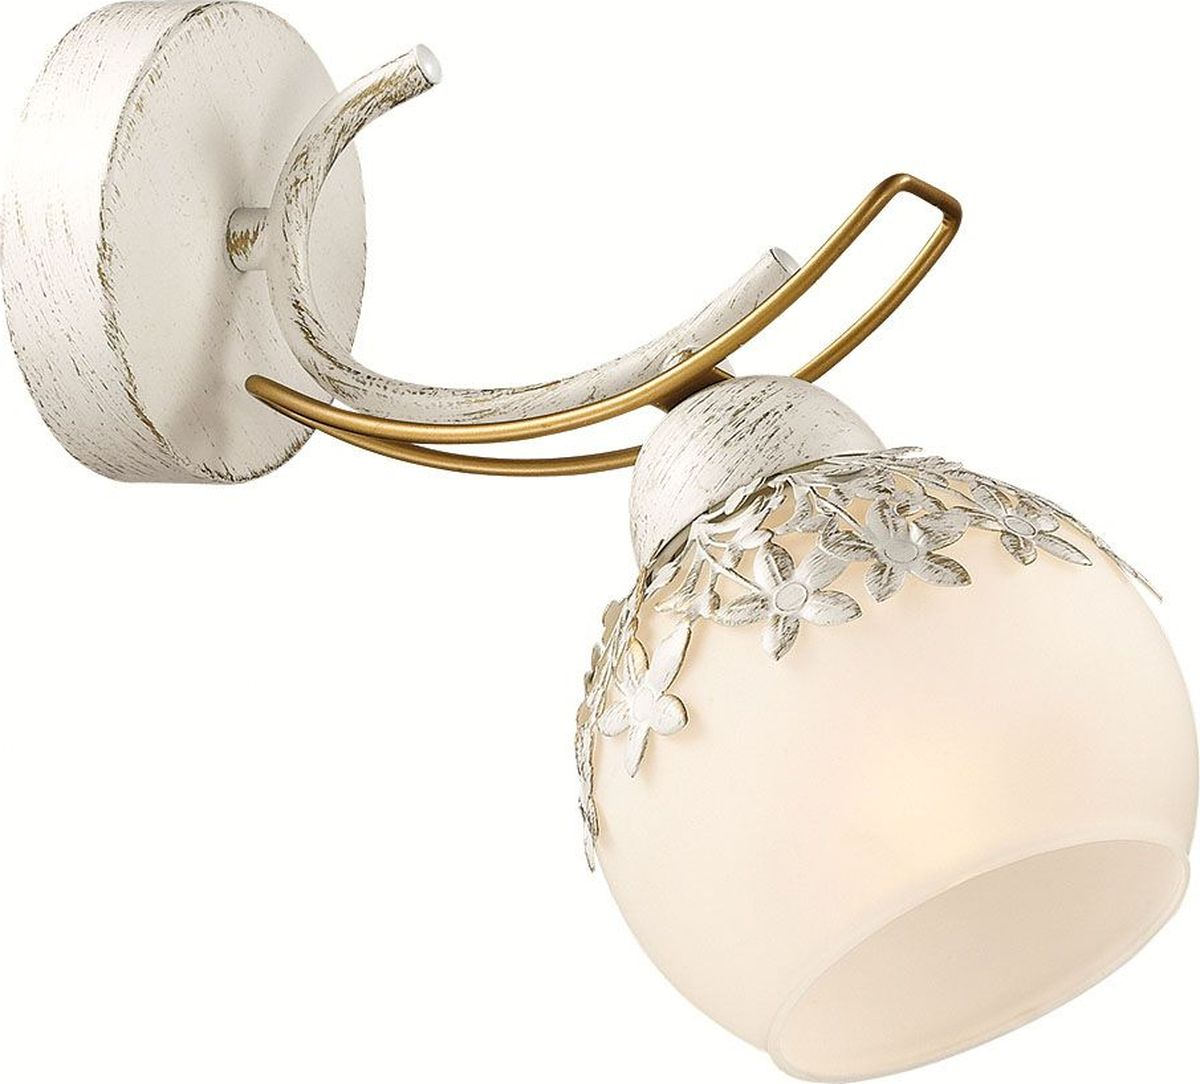 Бра Lumion Serisa, цвет: белый, E14, 60 Вт. 3247/1W